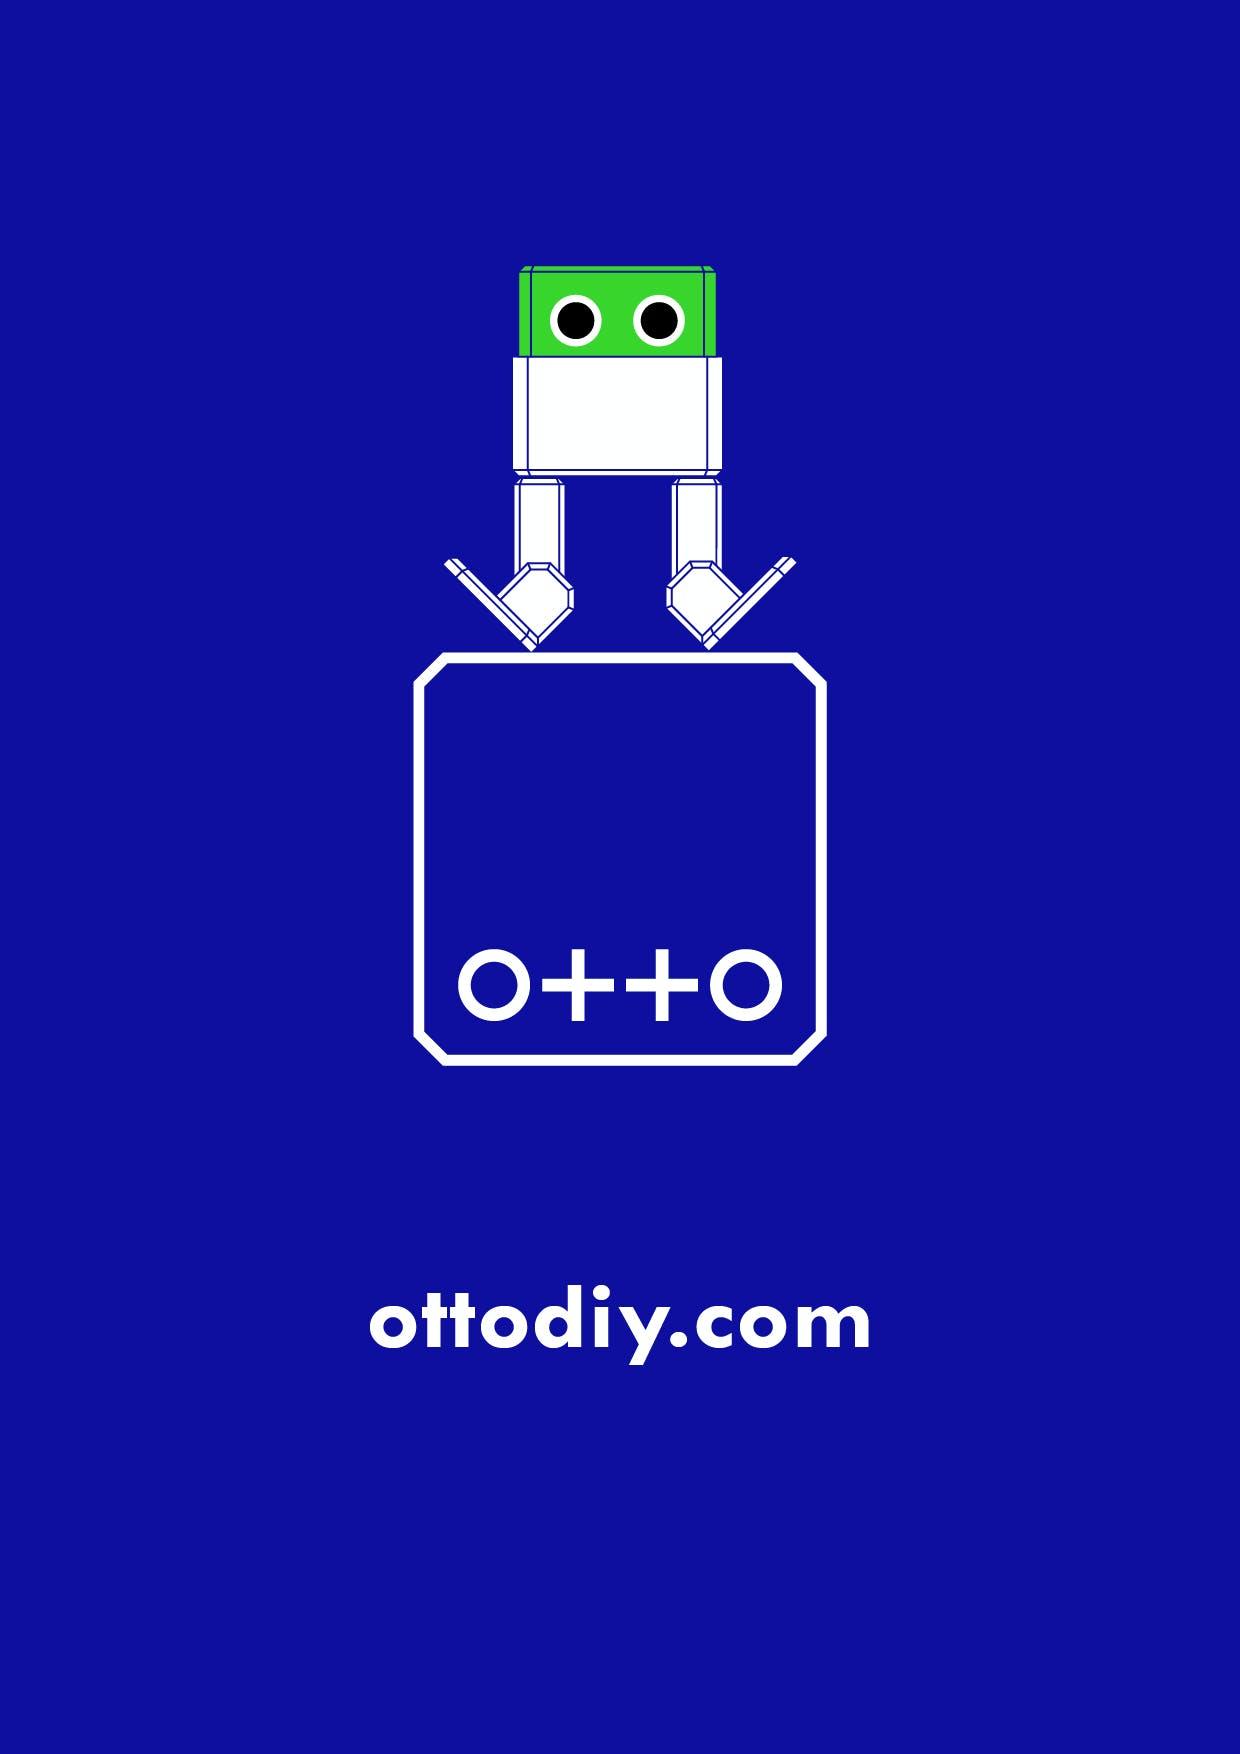 sign up as Ottobuilder in our website